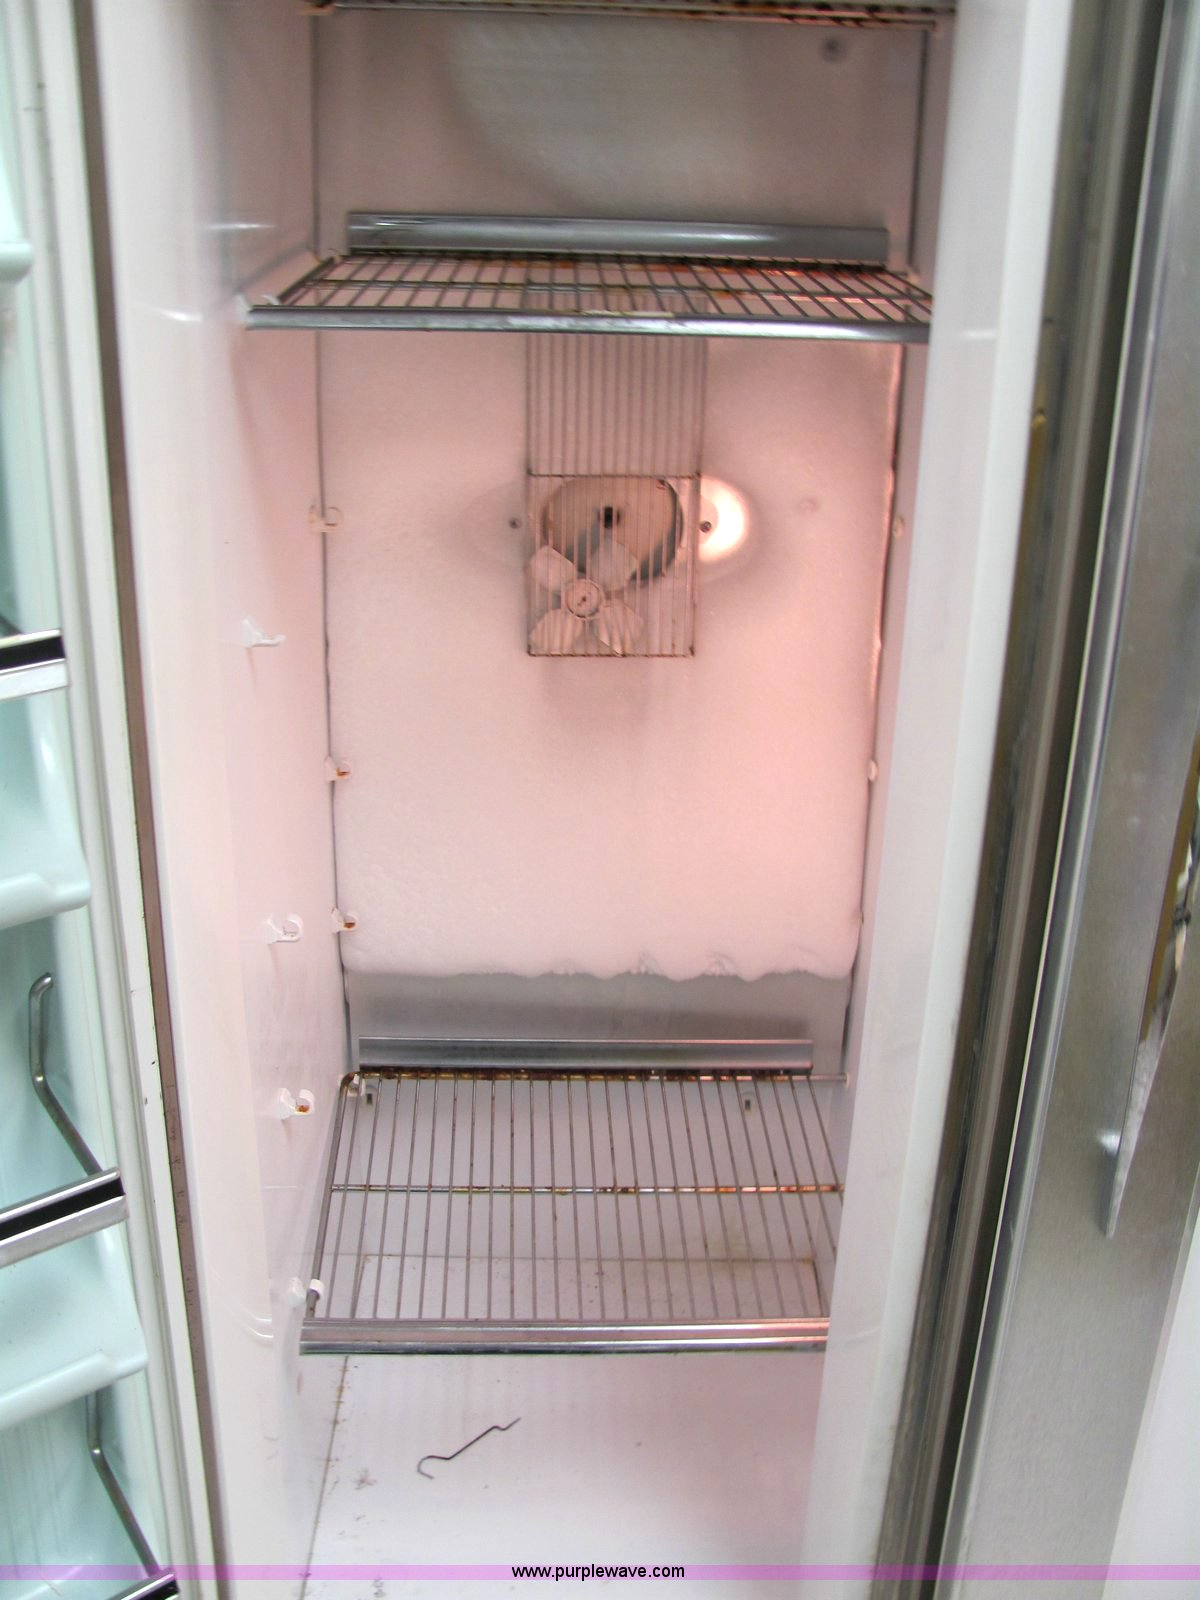 Trucks For Sale Wichita Ks >> Kelvinator Foodarama refrigerator/freezer in Wichita, KS | Item 6934 sold | Purple Wave